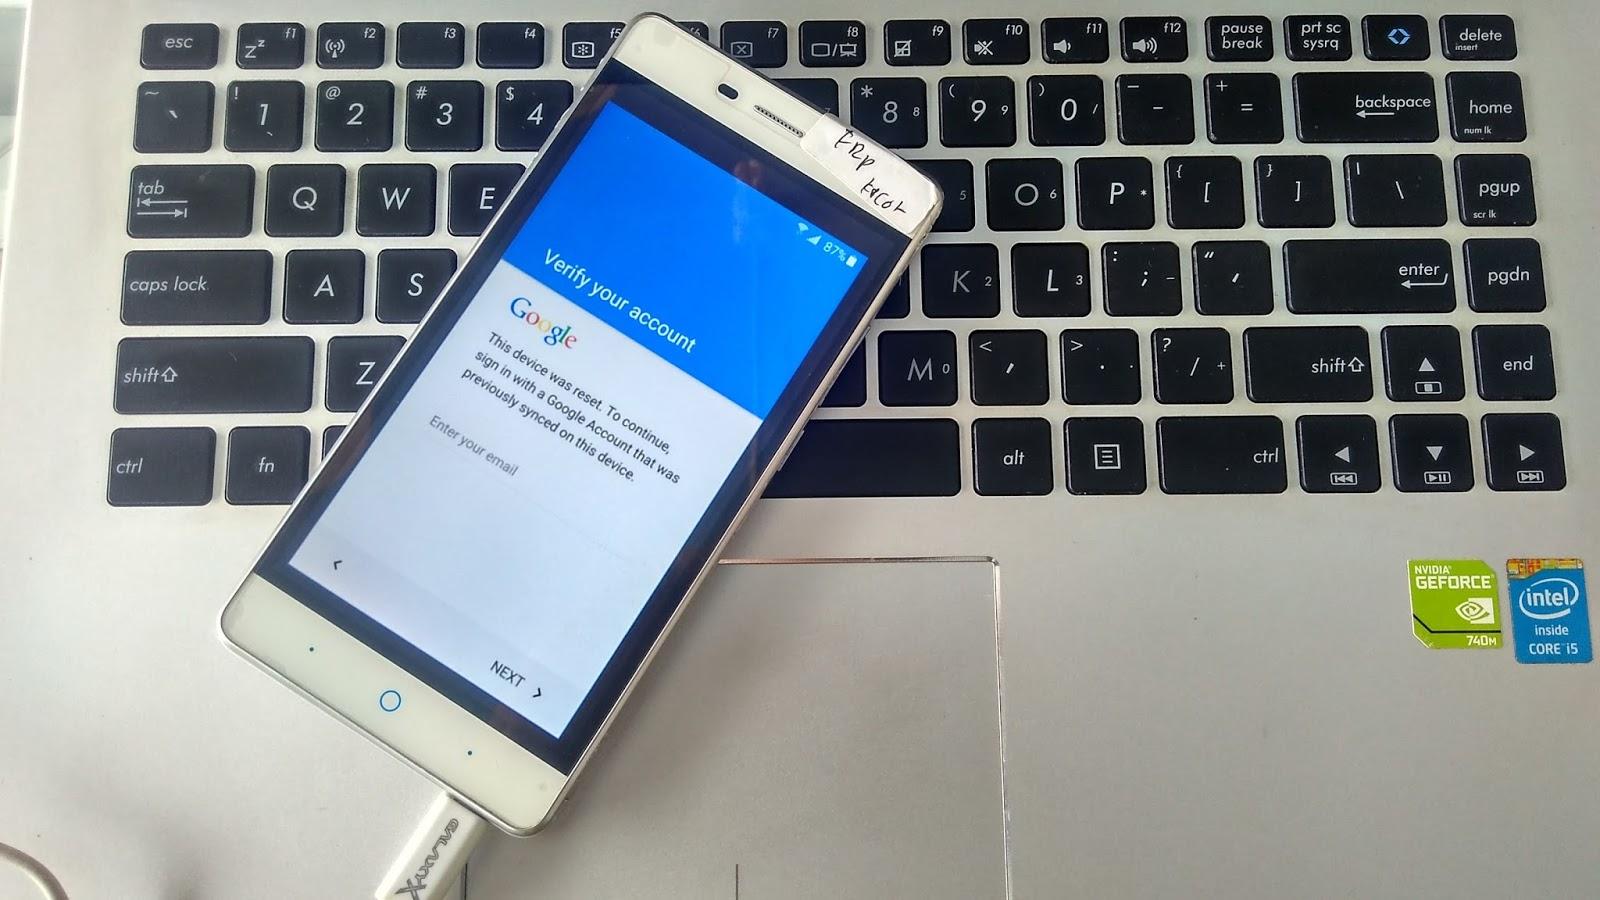 Cara Unlock Hdr Pubg Timi: Cara Mudah Bypass Google Account FRP ZTE V3 N939sc